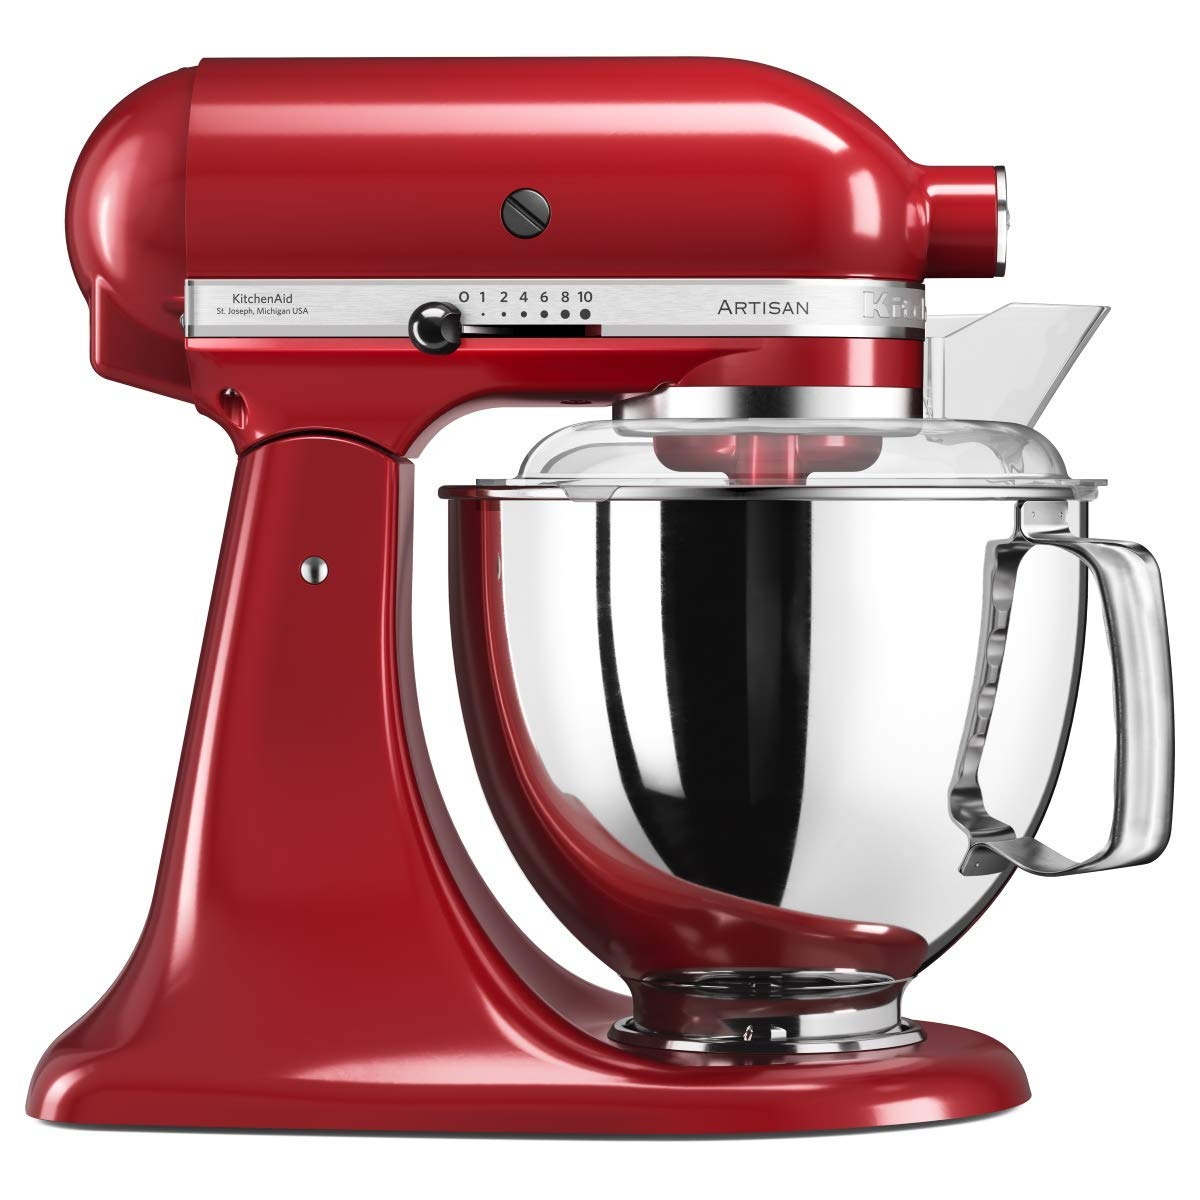 KitchenAid Artisan 5KSM175PS Robot de cocina (4, 8 L, Rojo, palanca, 220 RPM, Acero inoxidable, 300 W): Amazon.es